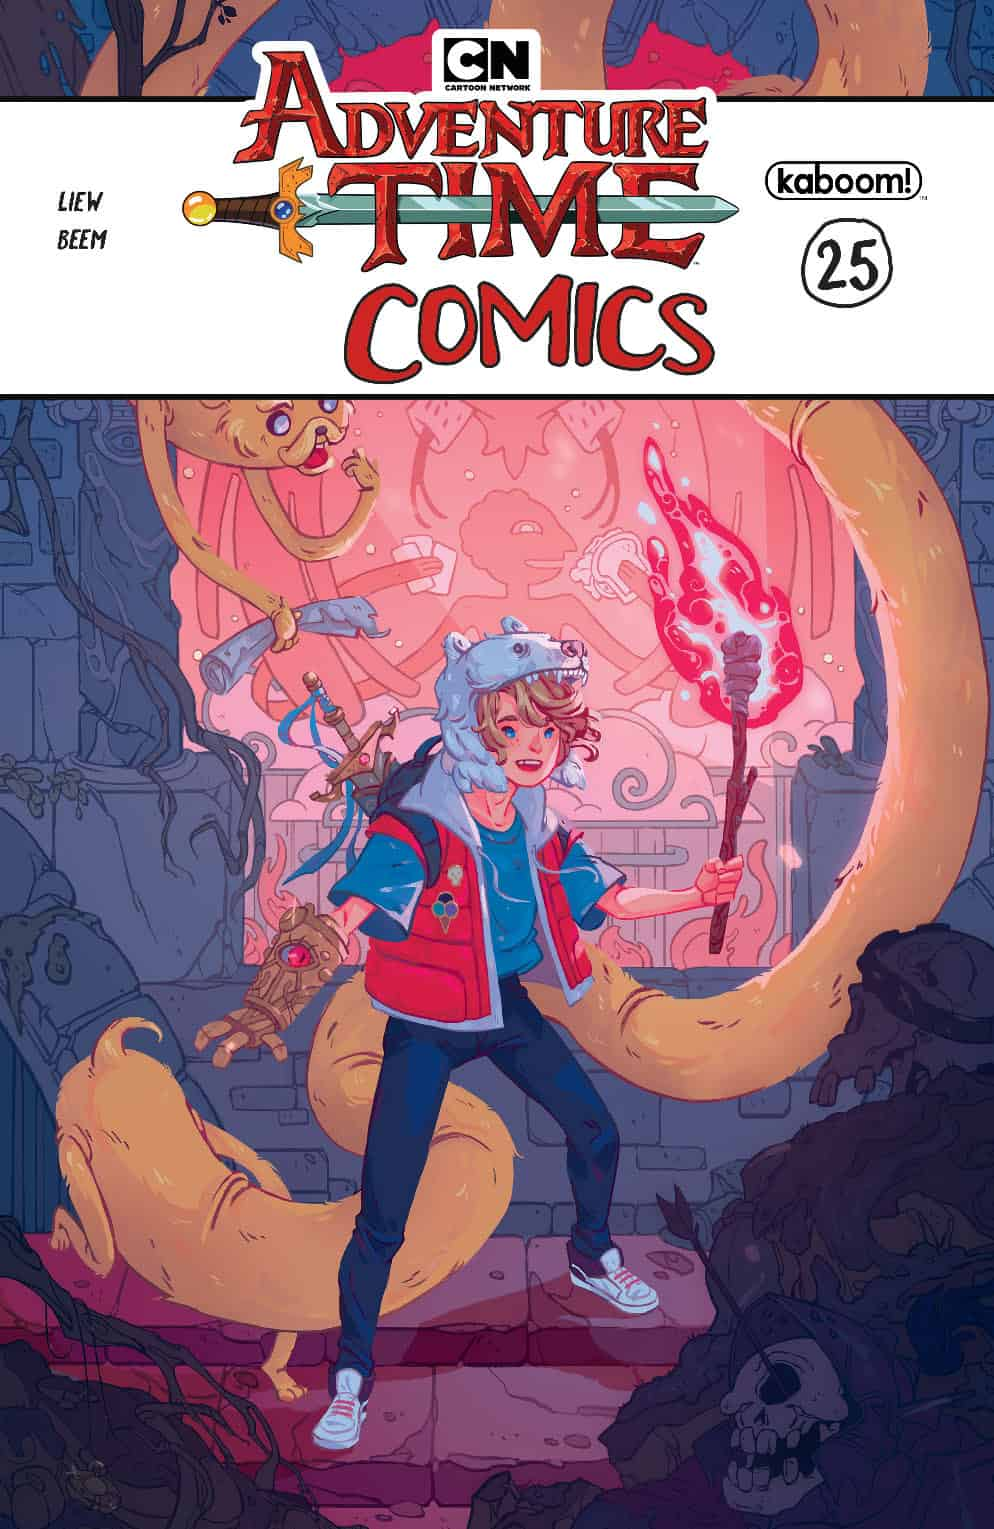 Adventure Time Comics #25